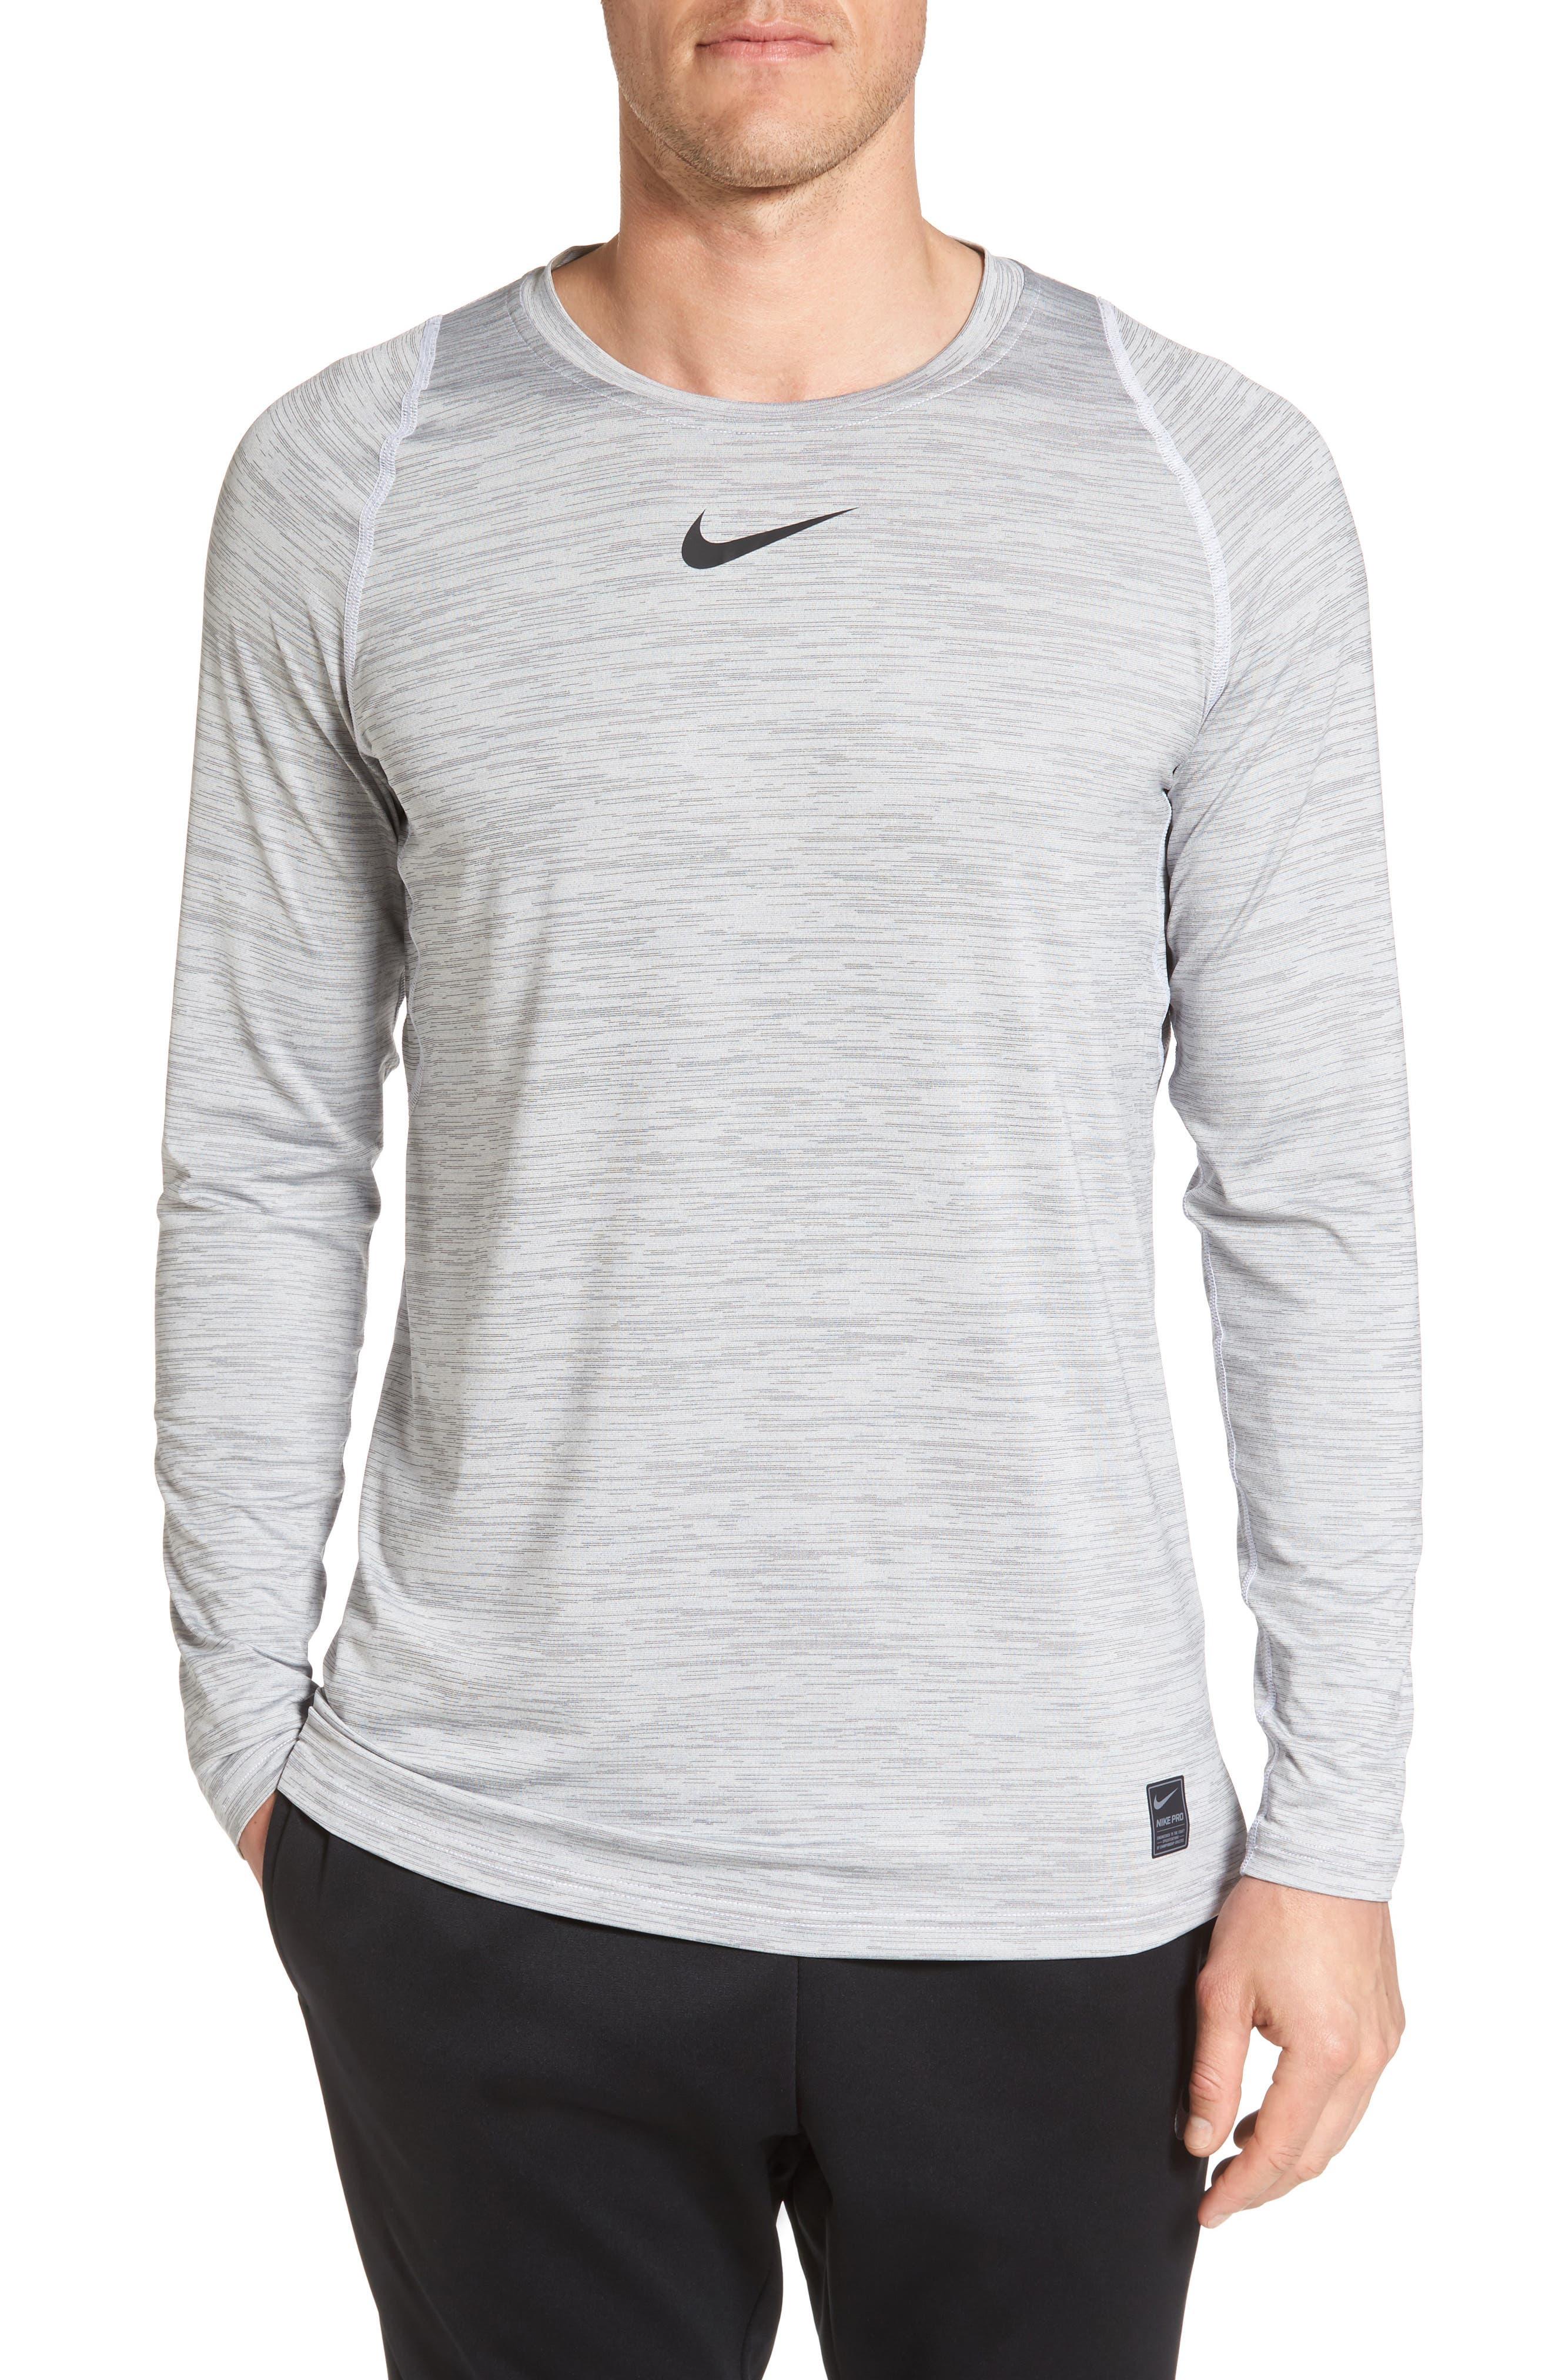 Nike Pro Long Sleeve T-Shirt, White